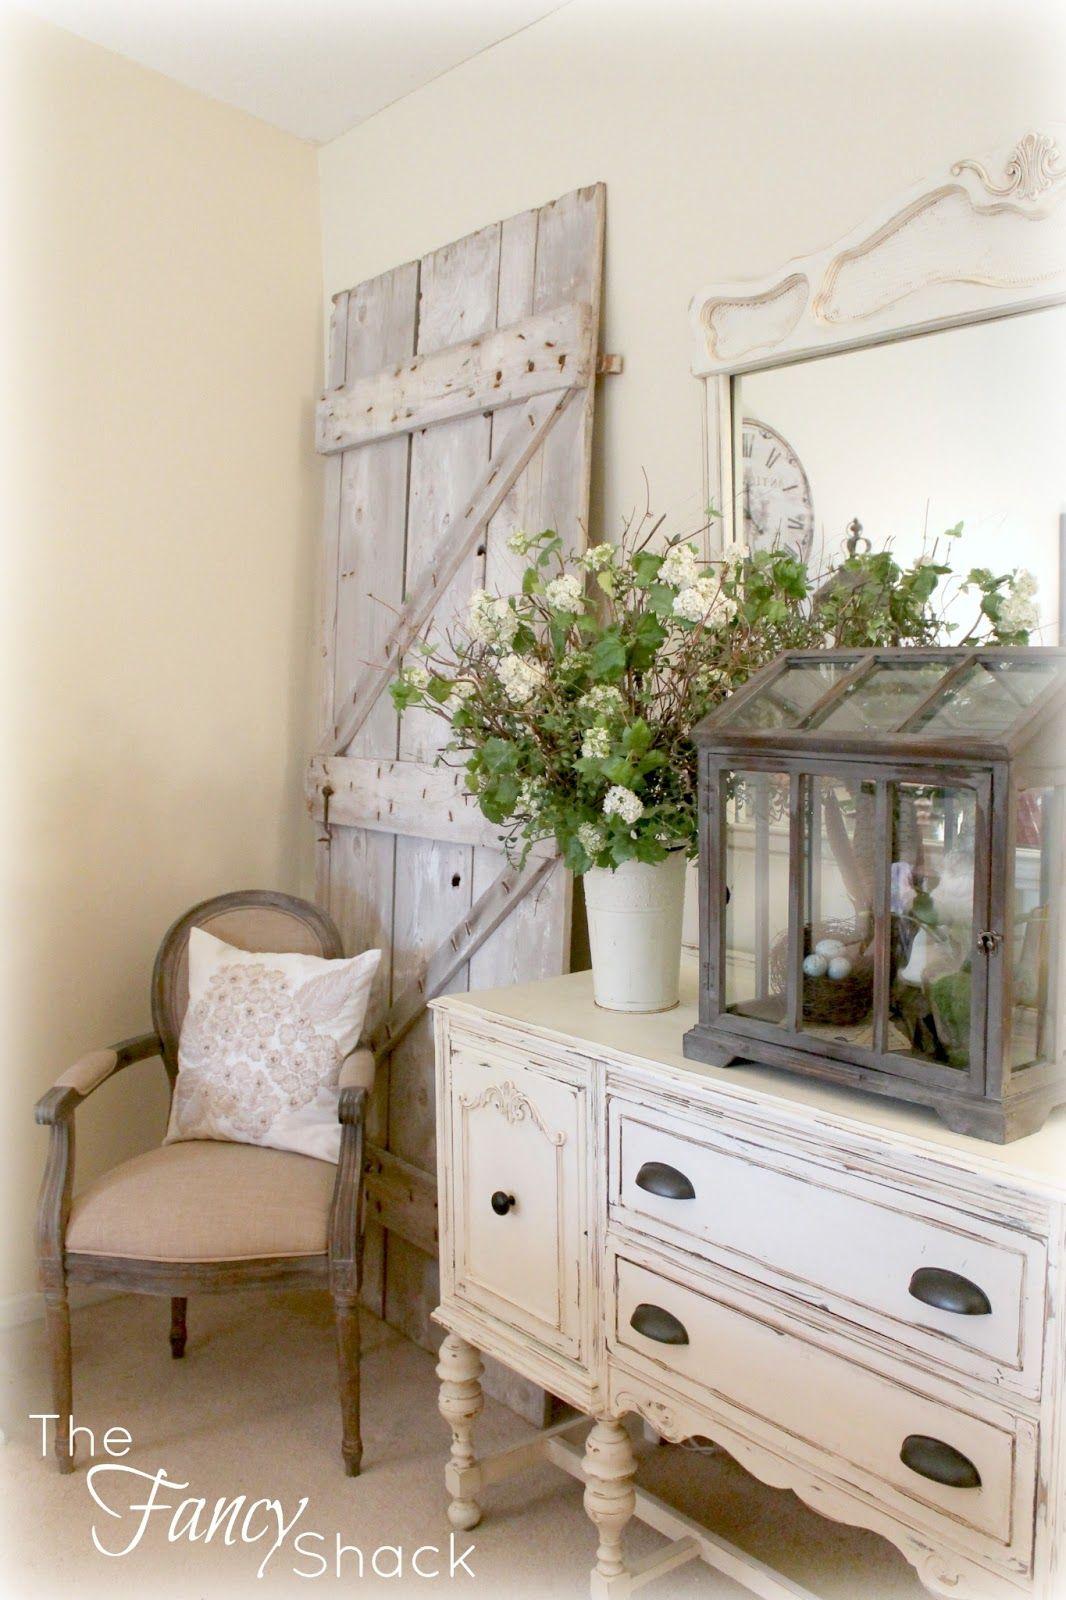 Fullsize Of Chic Small Living Room Ideas